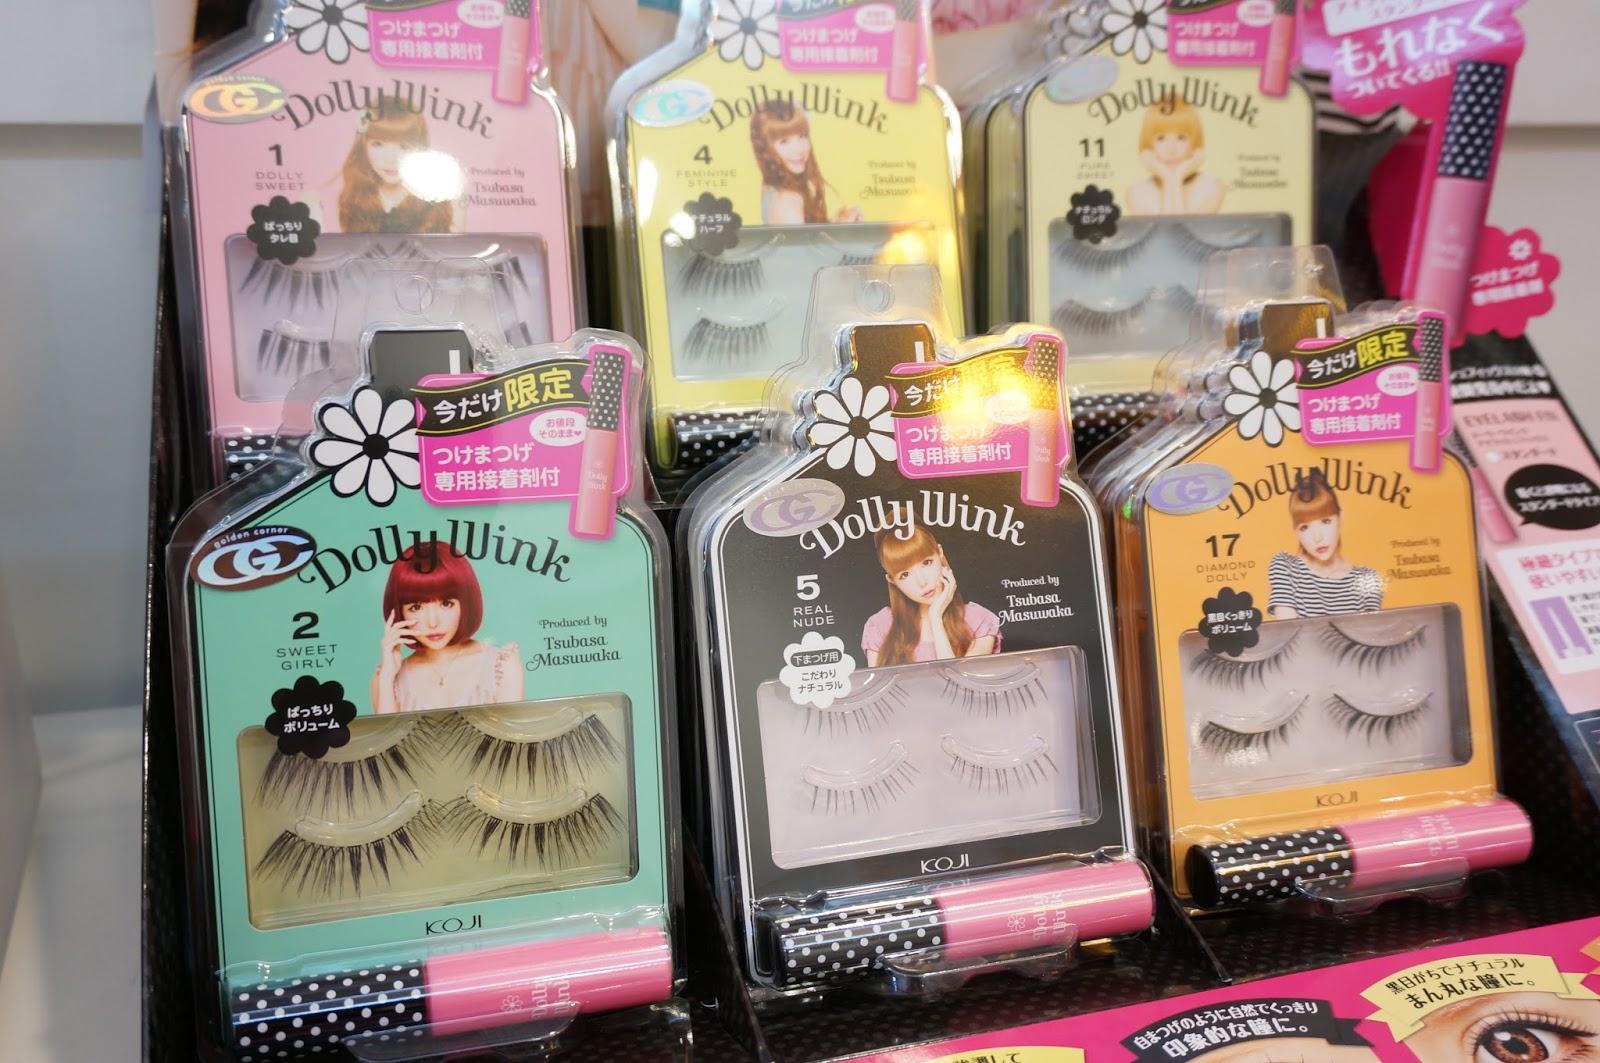 Koji Dolly Wink Workshop Little Pantry Ioi Mall Carolyntay